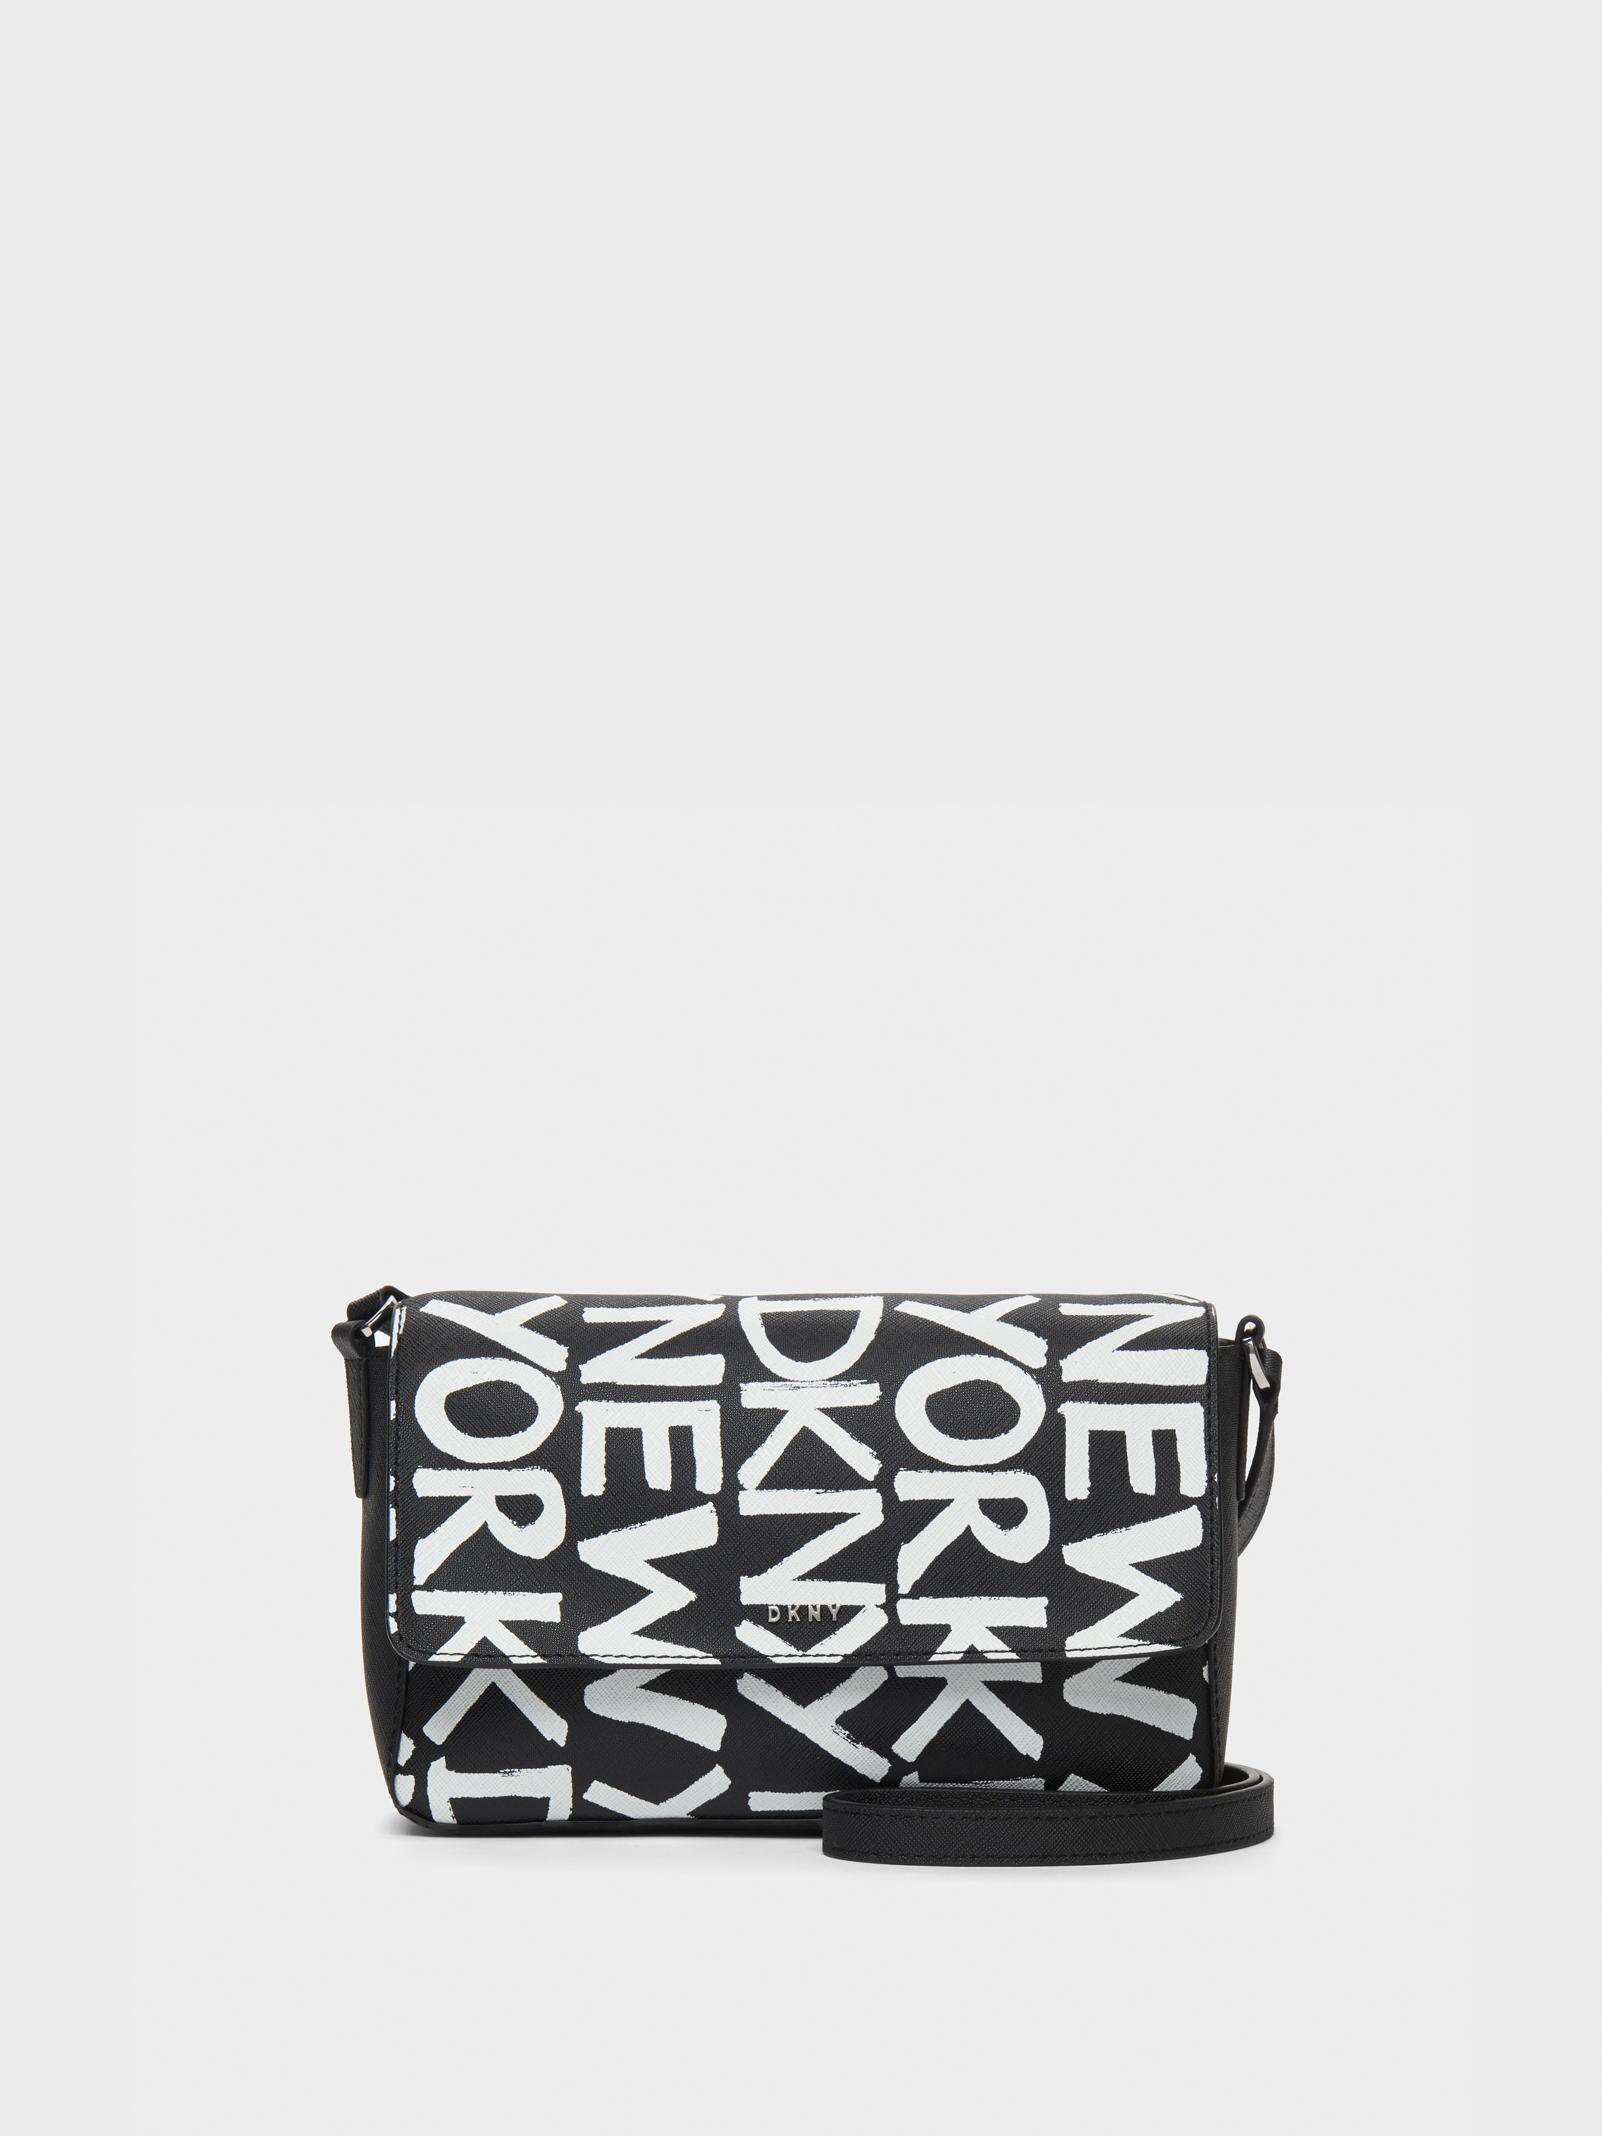 DKNY - Black Brayden Printed Flap Crossbody - Lyst. View fullscreen ae8e3abe44f7a